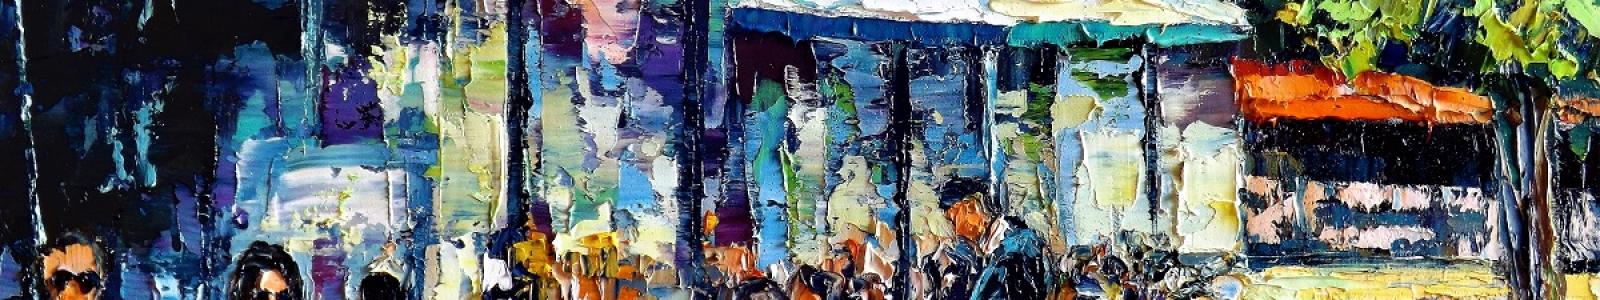 Gallery Painter Sergey Efremov